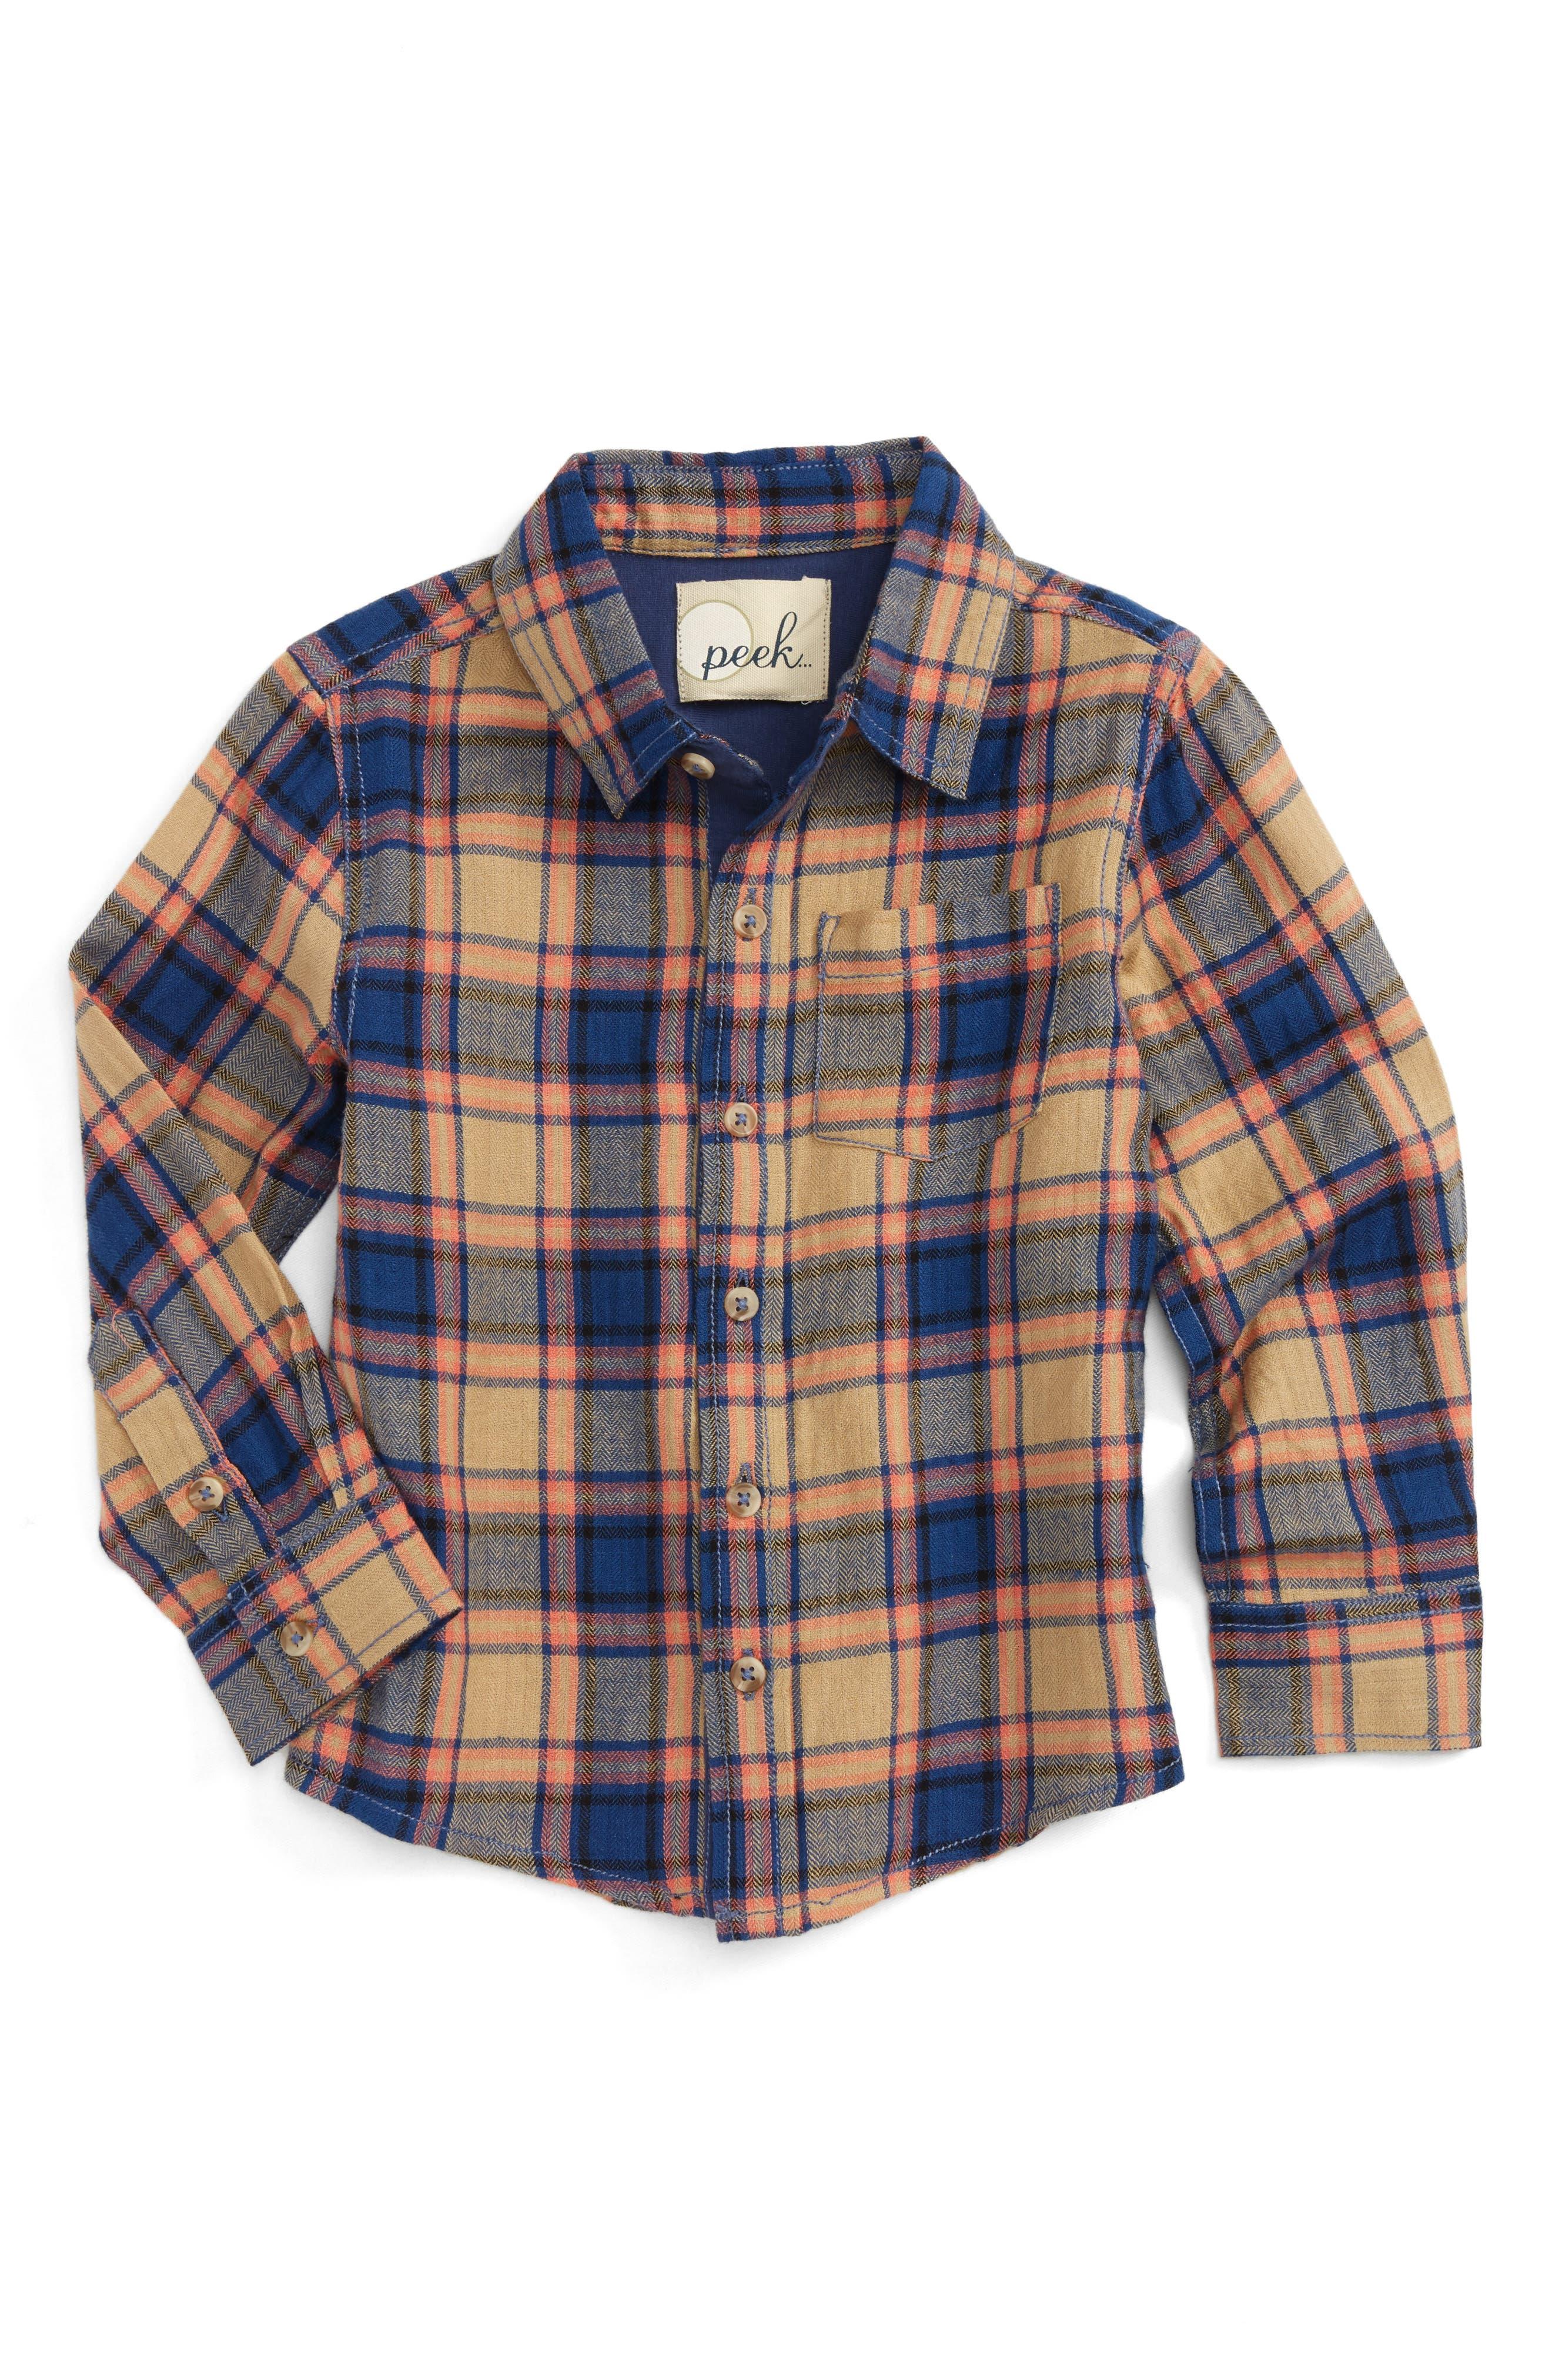 Peek Henry Plaid Woven Shirt (Toddler Boys, Little Boys & Big Boys)